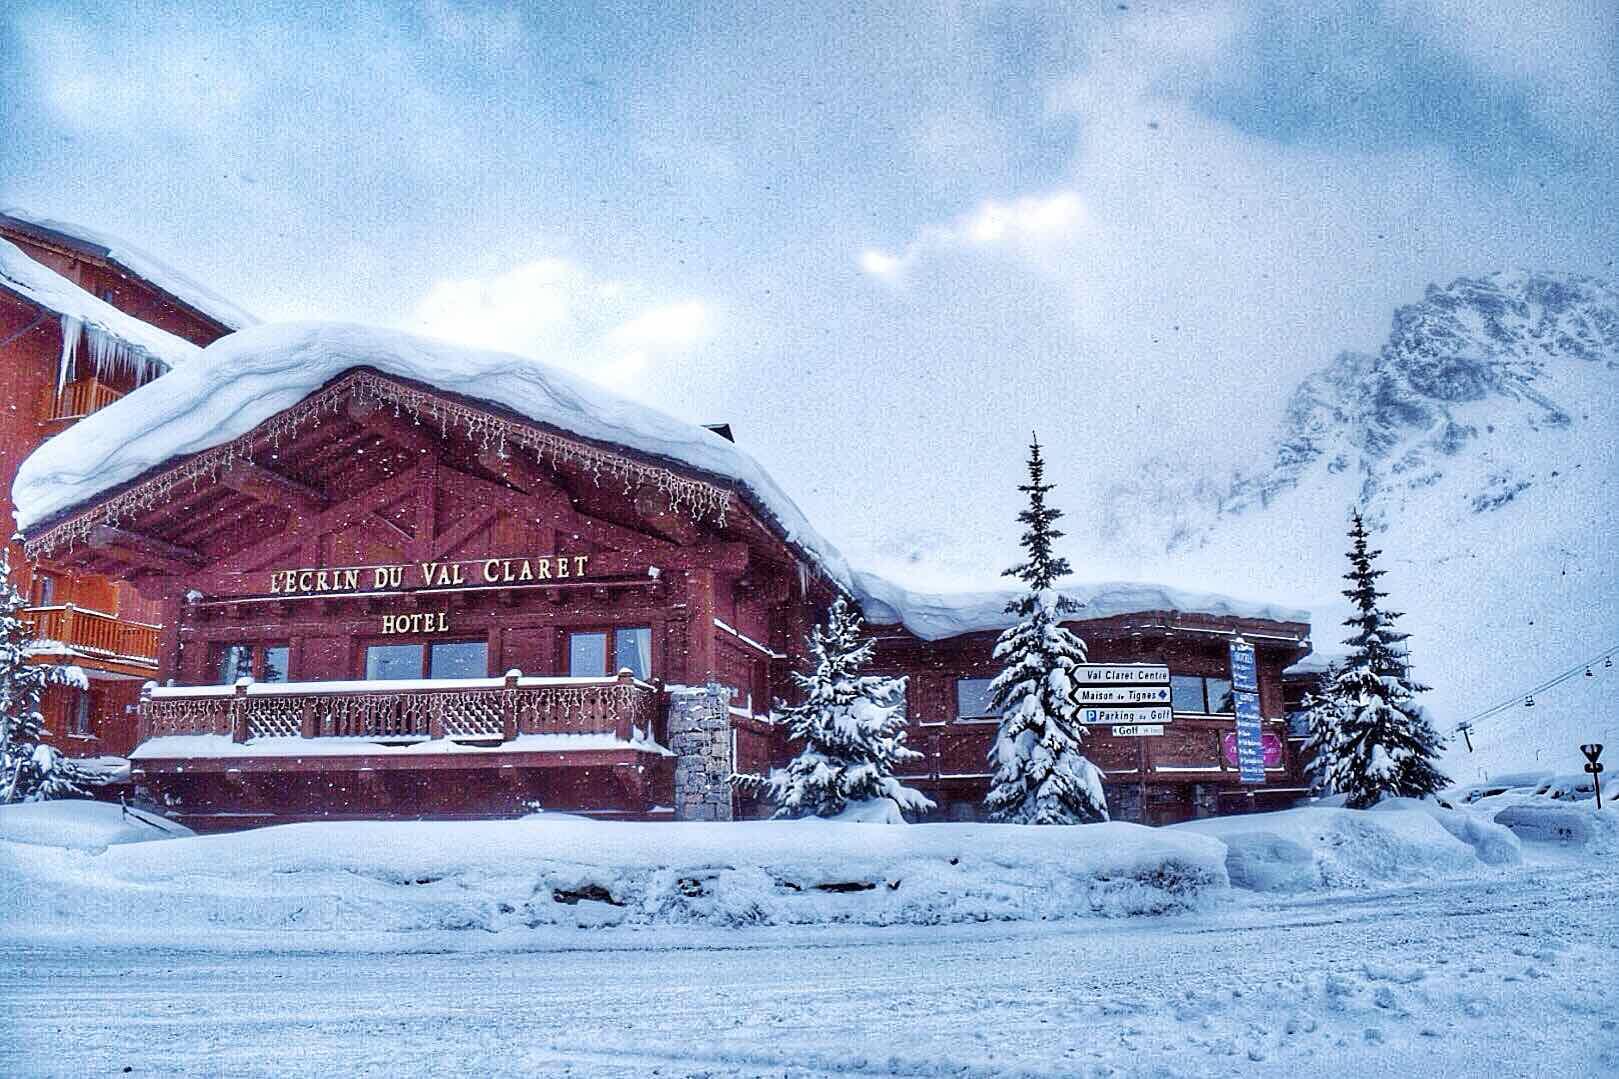 Hotel L'ecrin Du Val Claret